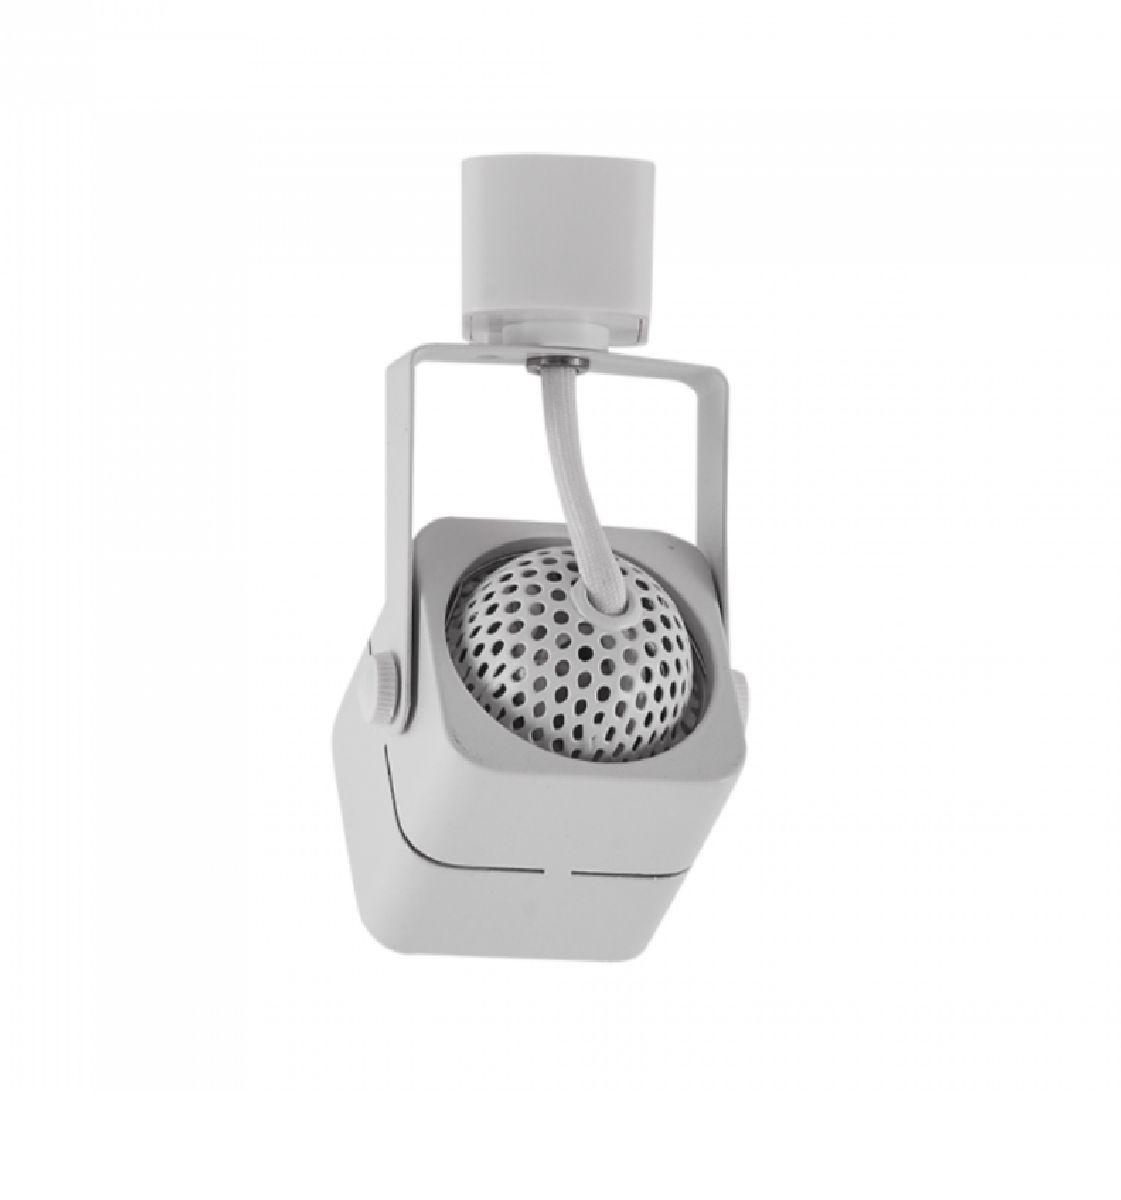 Kit Trilho Eletrificado 1,5m Branco Nordecor + 4 Spot Quad MR16 / GU10